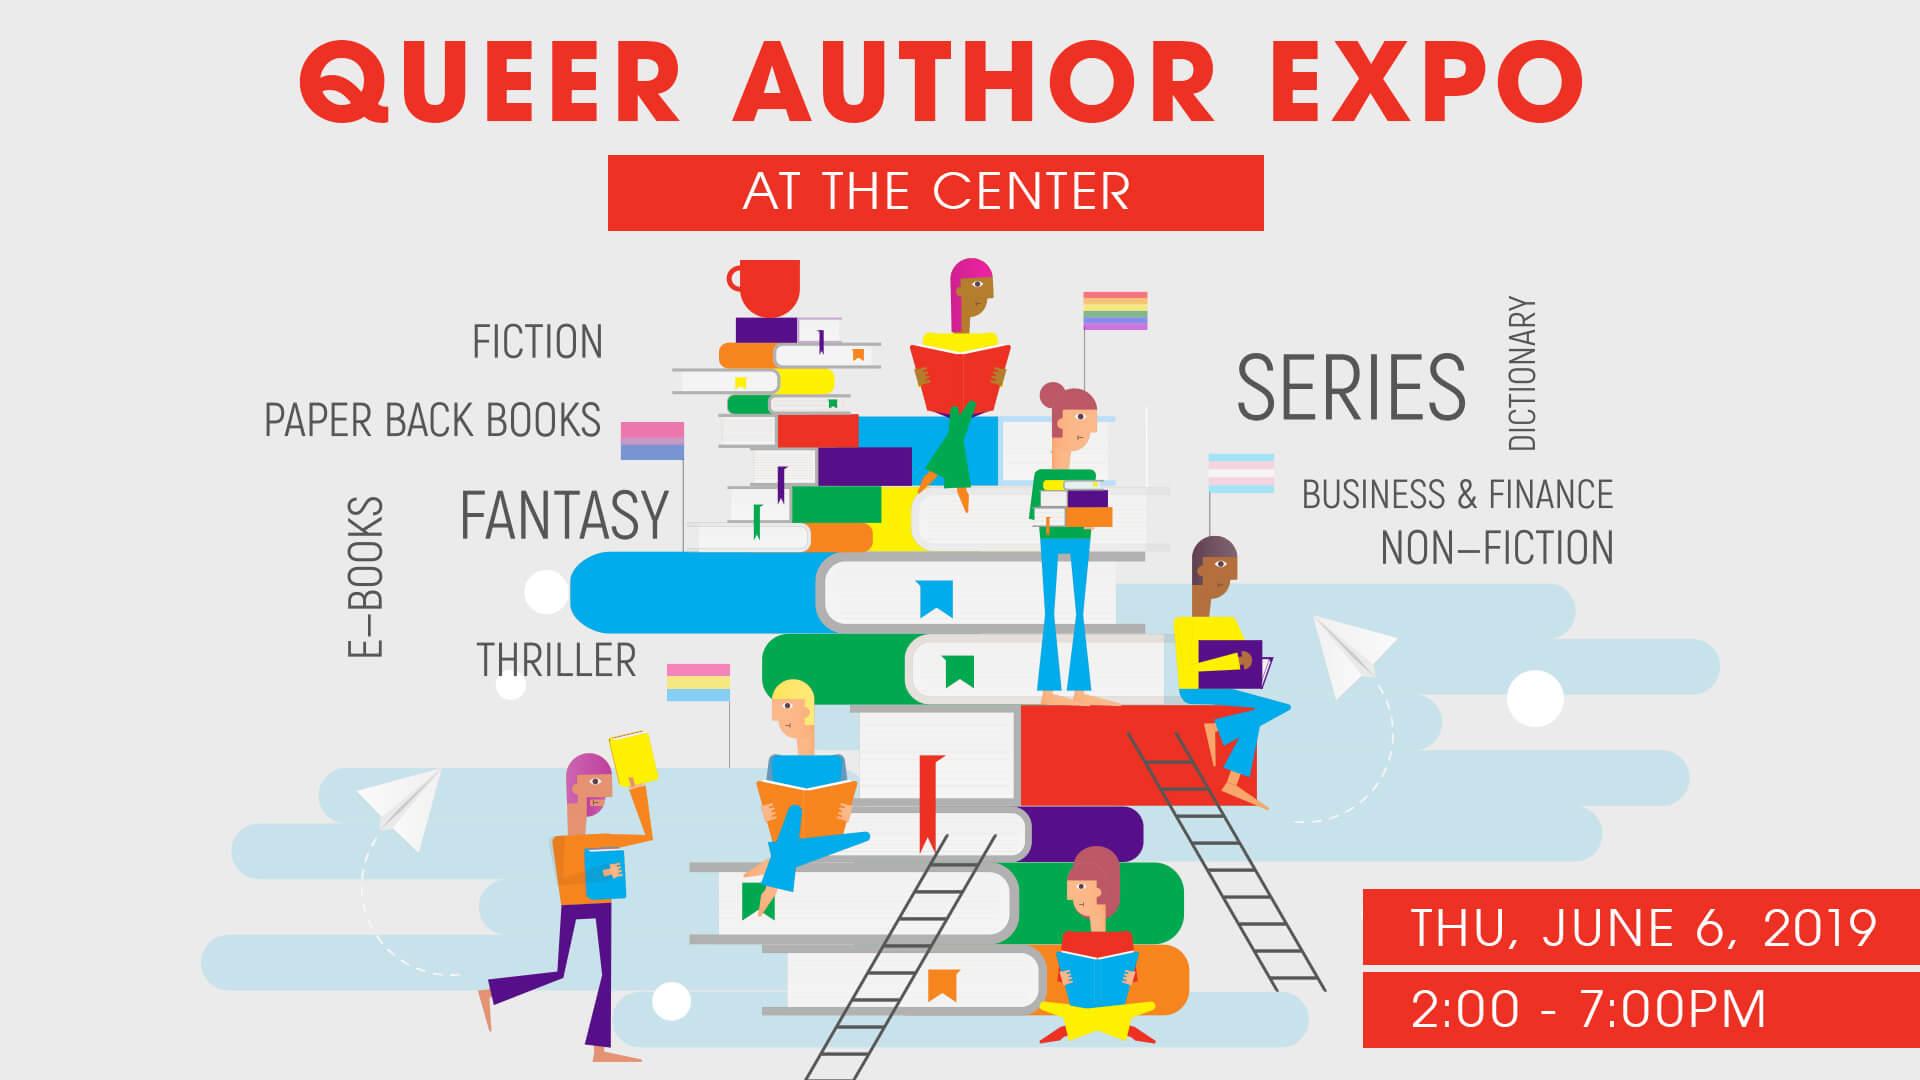 Queer Author Expo - June 6, 2019